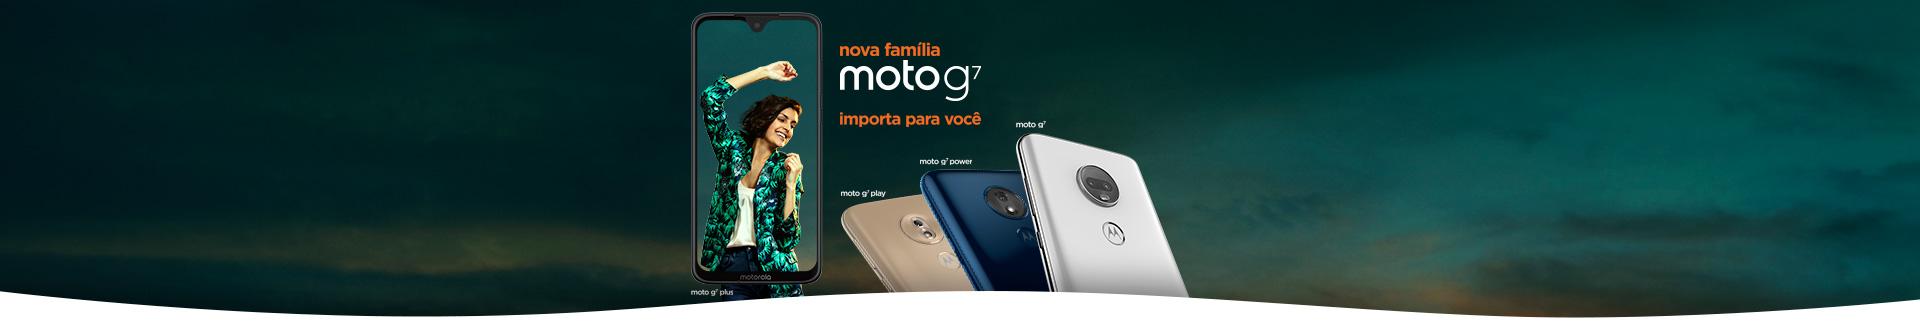 Nova Família Moto G7